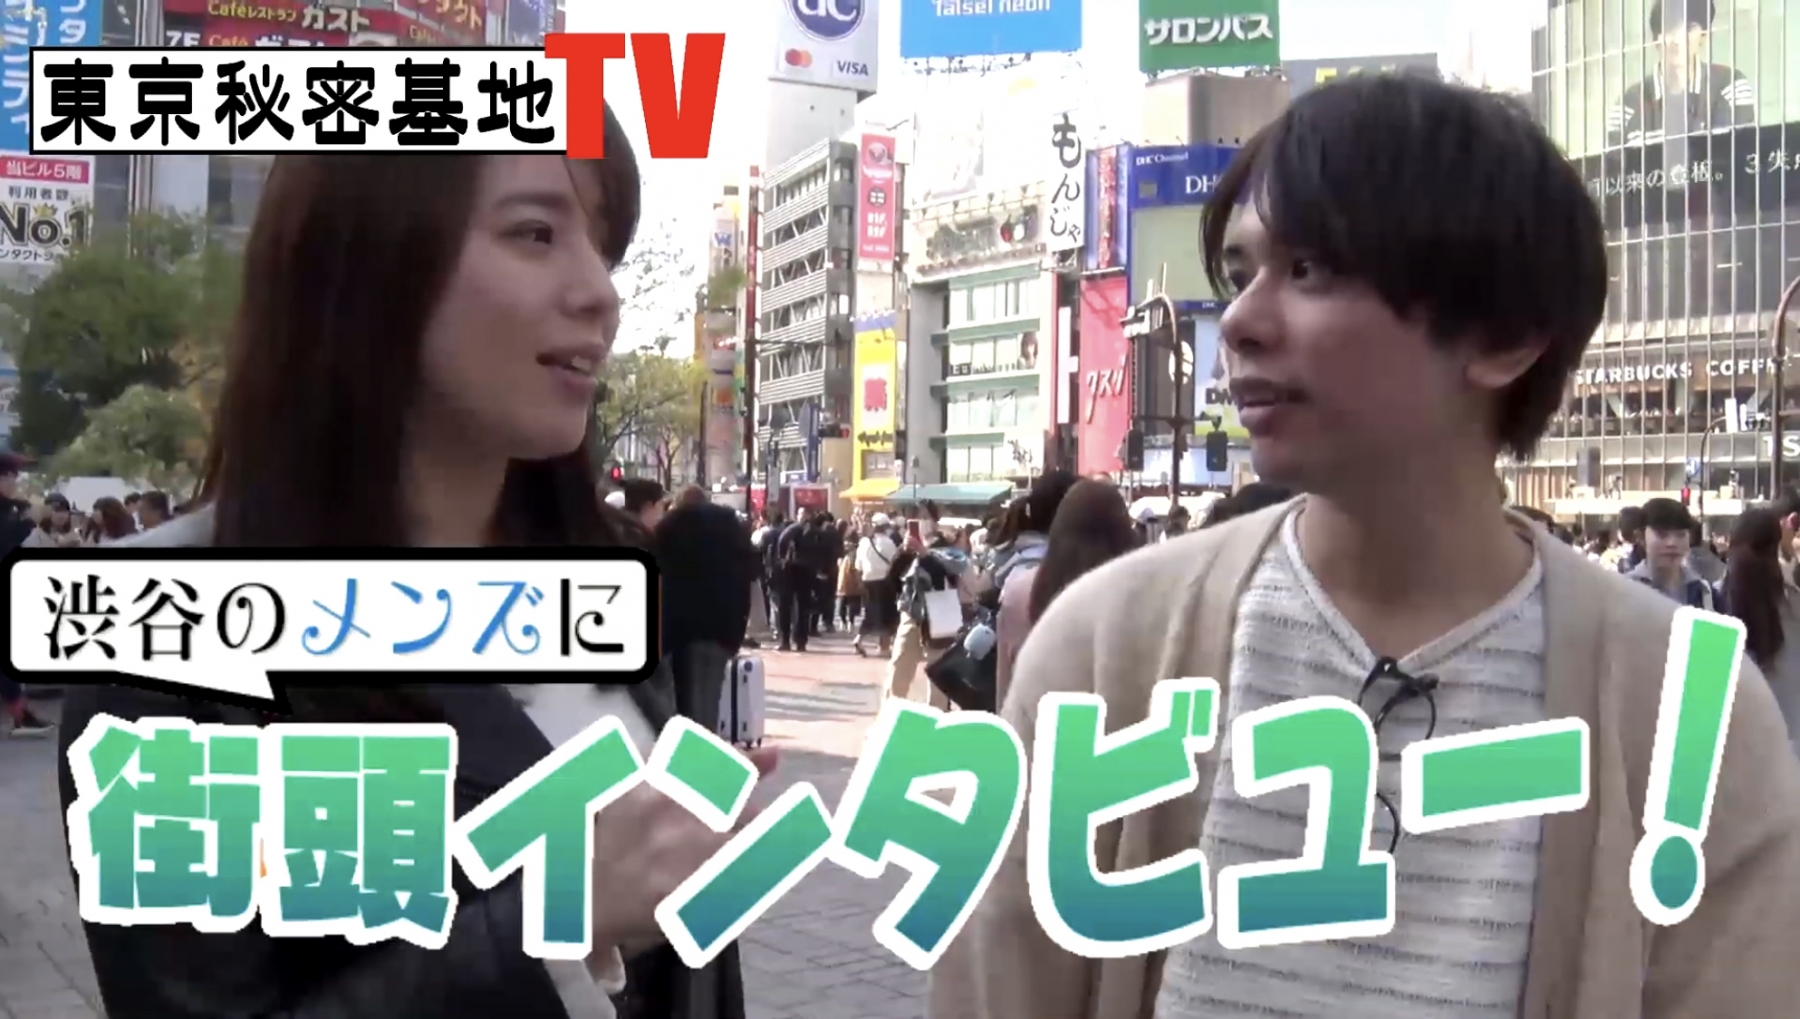 KONOE(コノエ) 街頭インタビュー